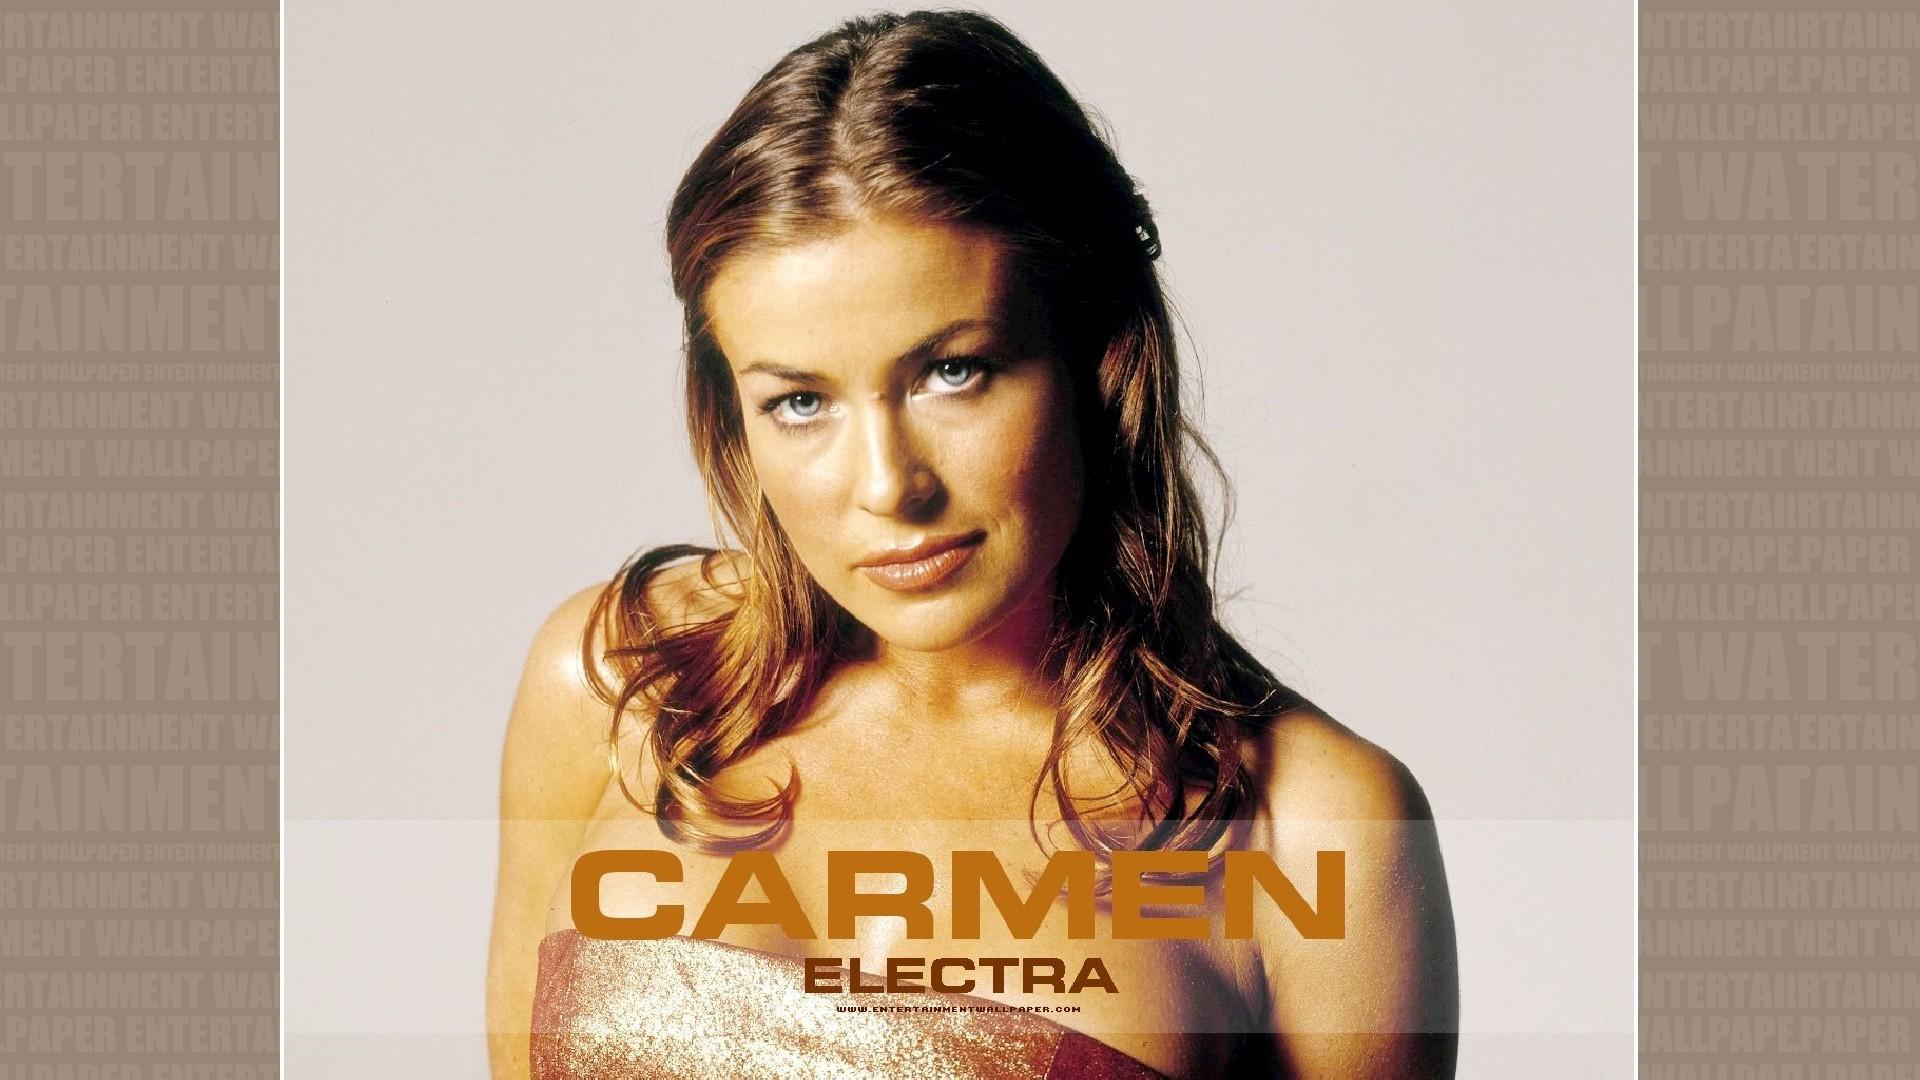 Carmen Electra Wallpaper – Original size, download now.